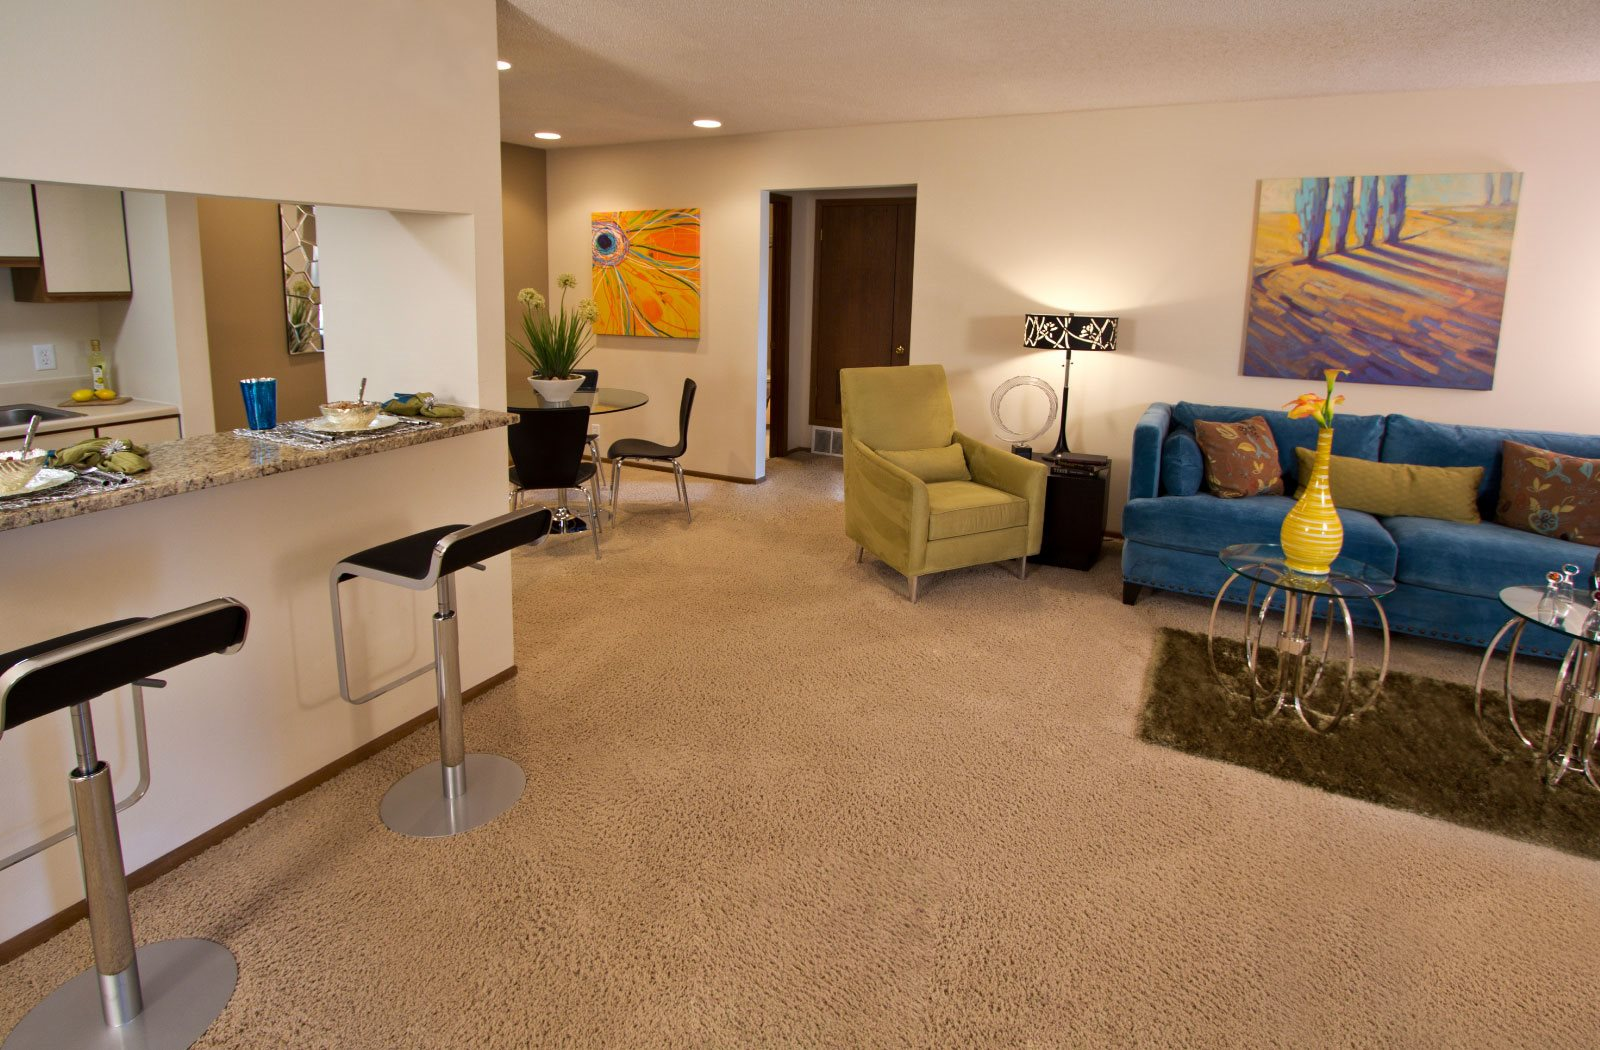 LionsHead Apartments | Apartments in Omaha, NE